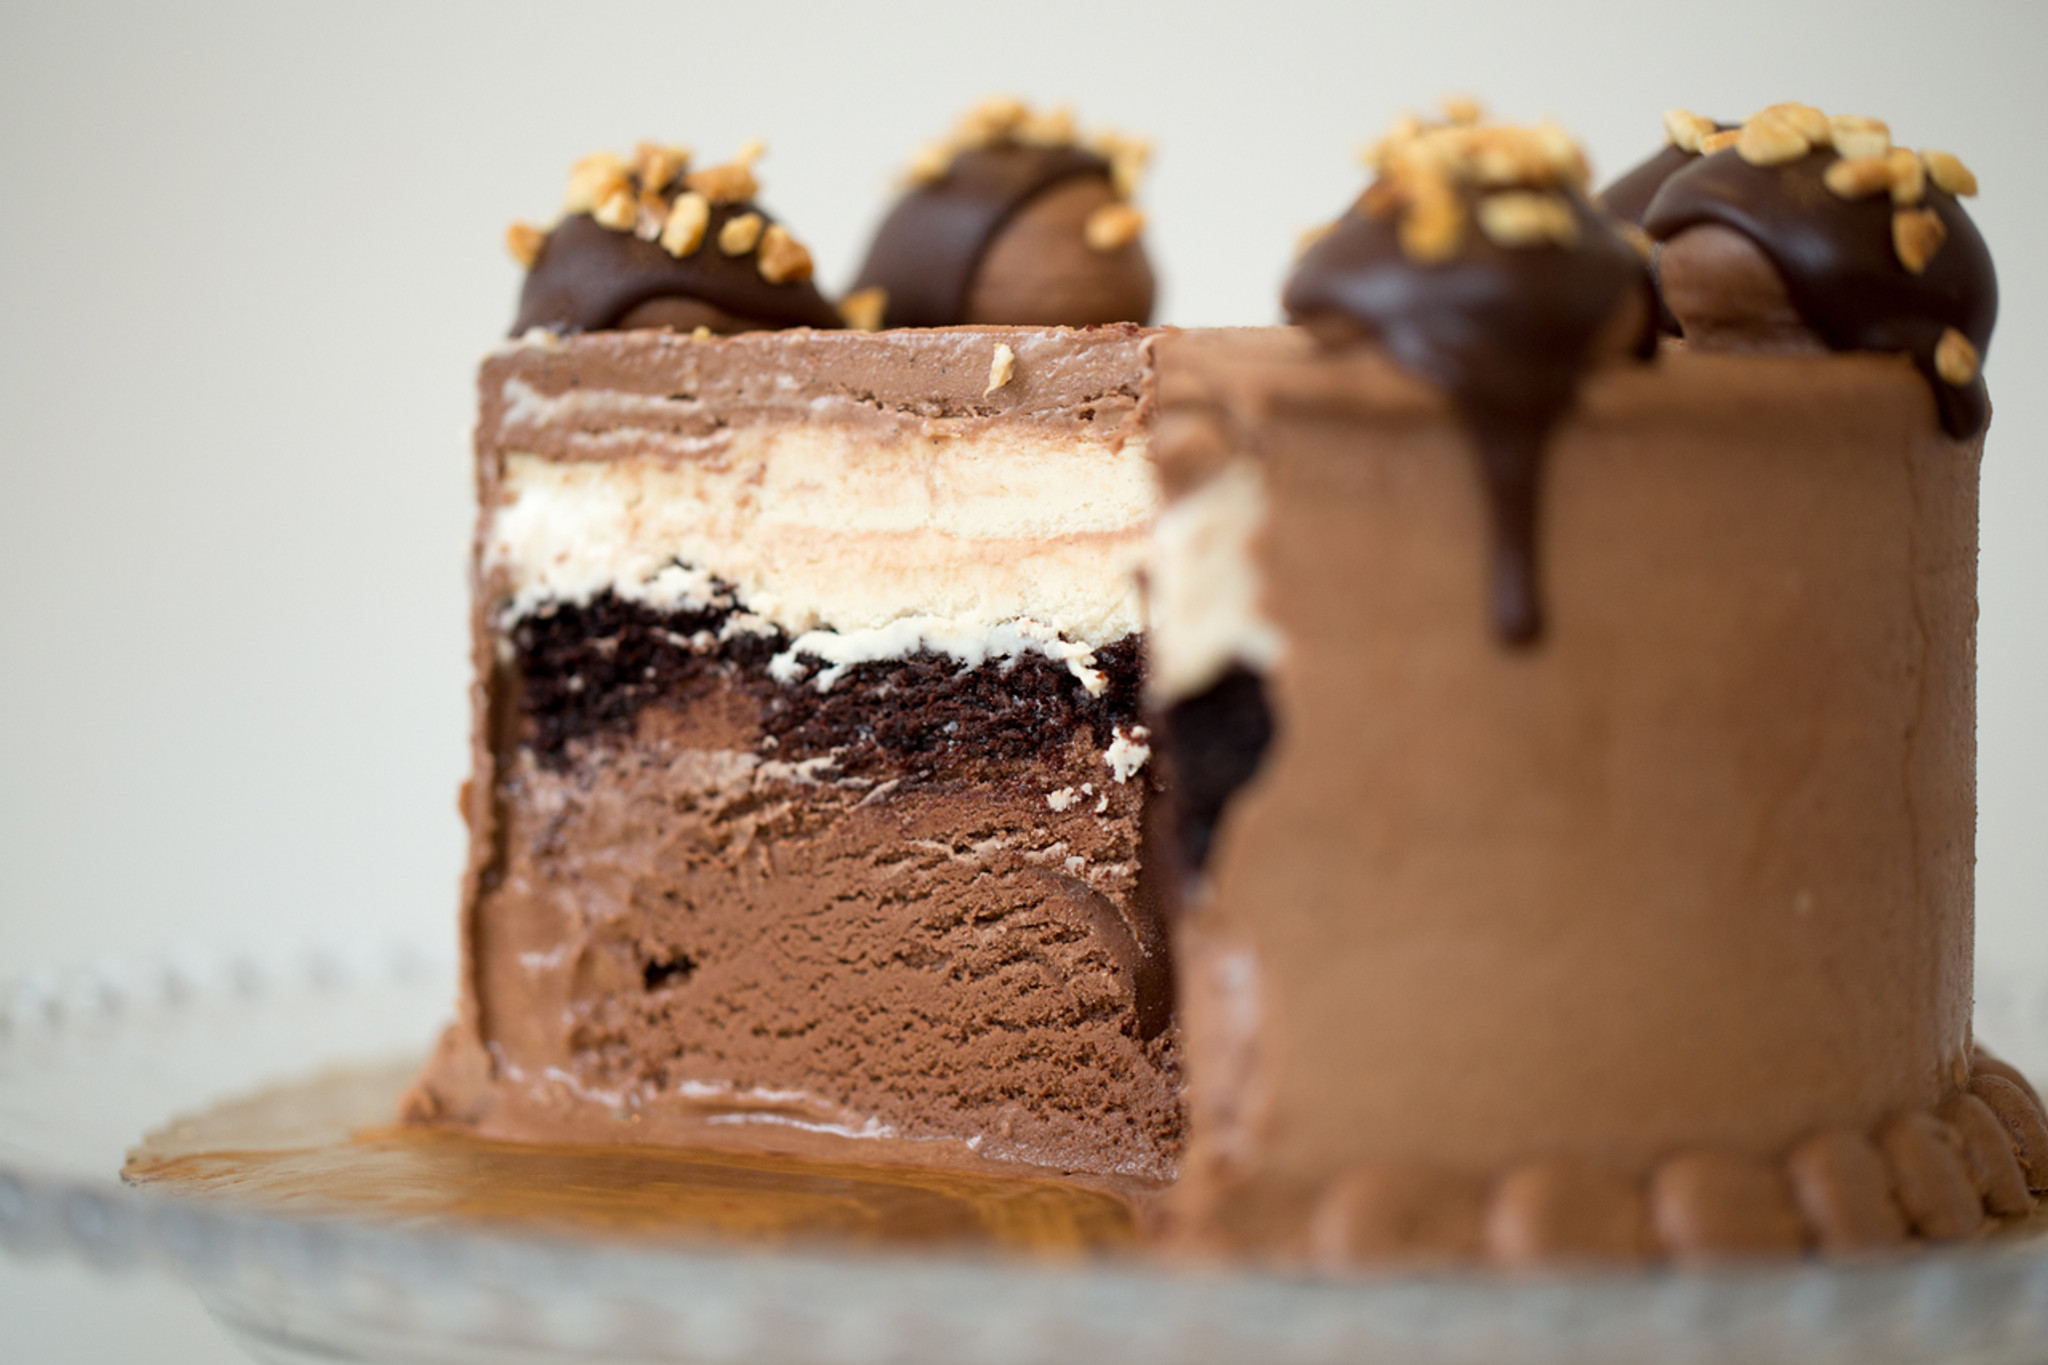 Ingredient Baked Ice Cream Cake